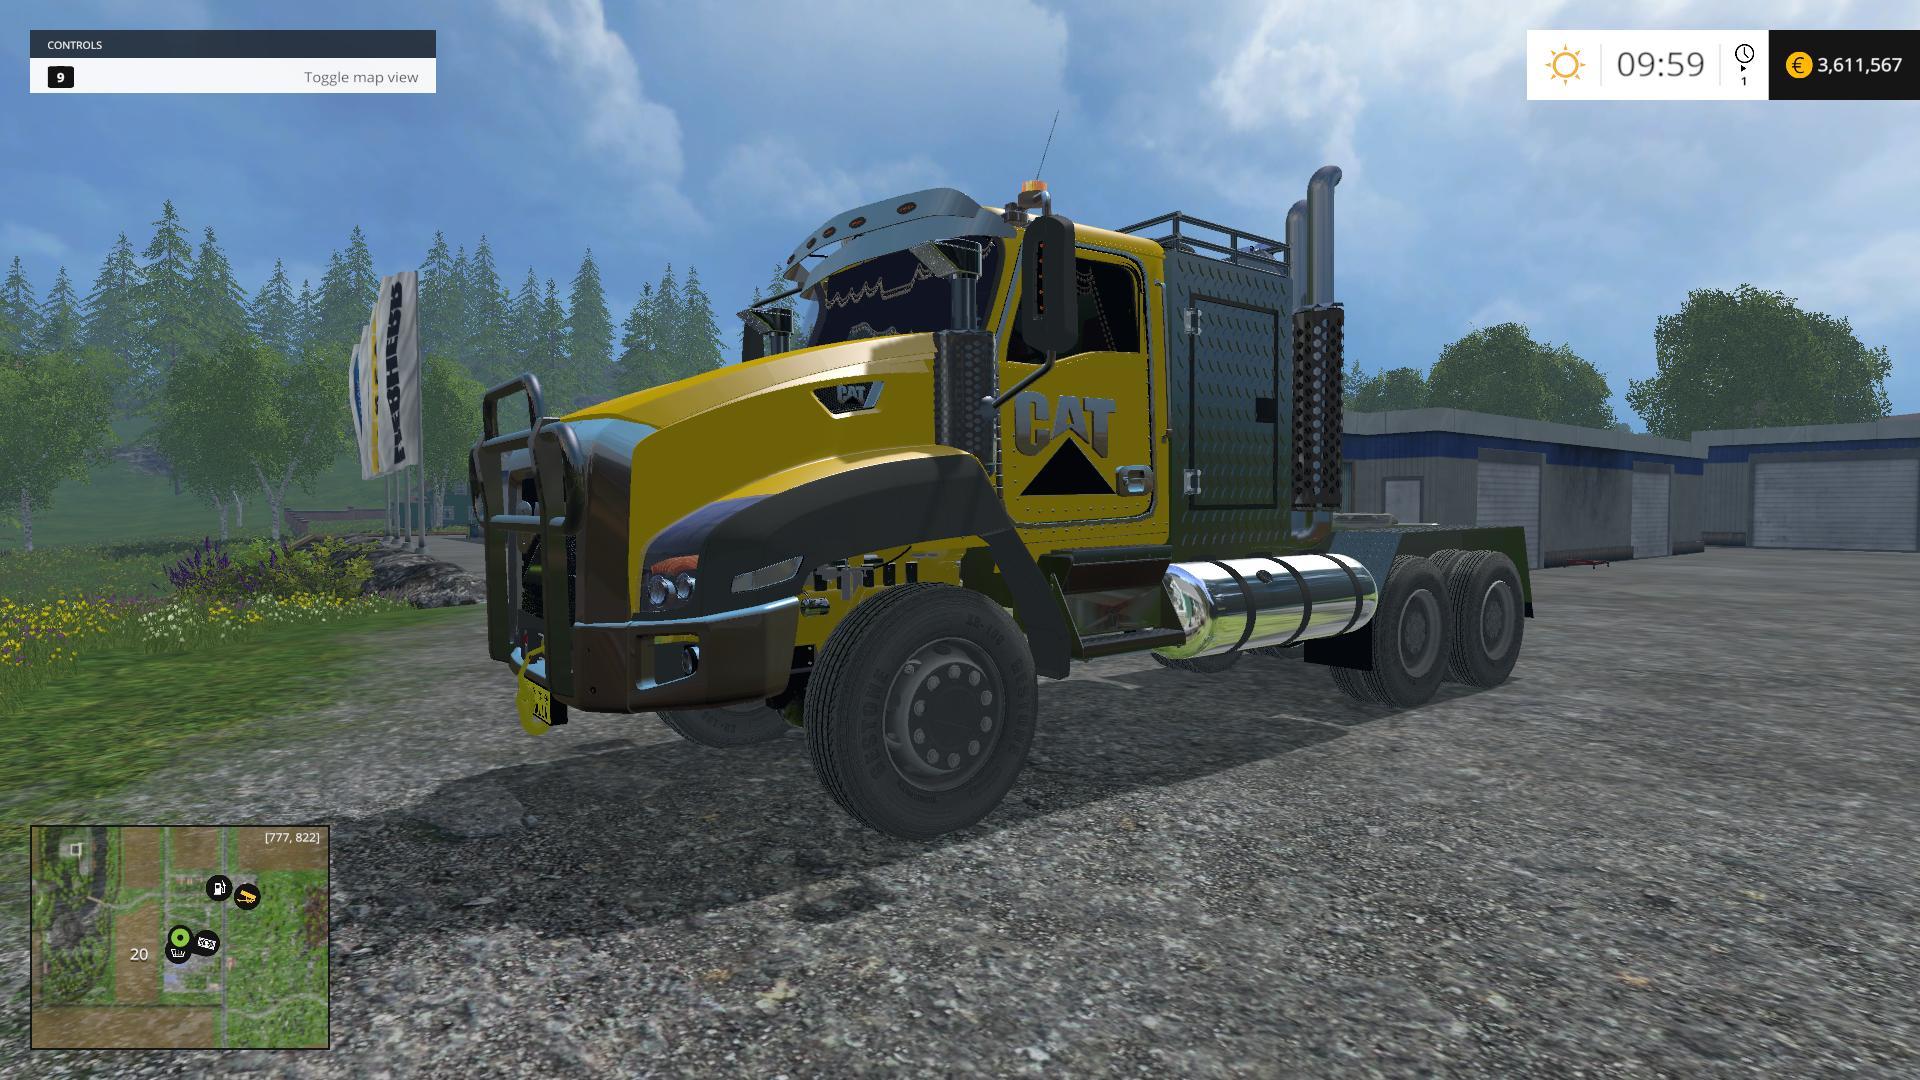 caterpillar truck v1 0 fs 2015 farming simulator 2019 2017 2015 mod. Black Bedroom Furniture Sets. Home Design Ideas